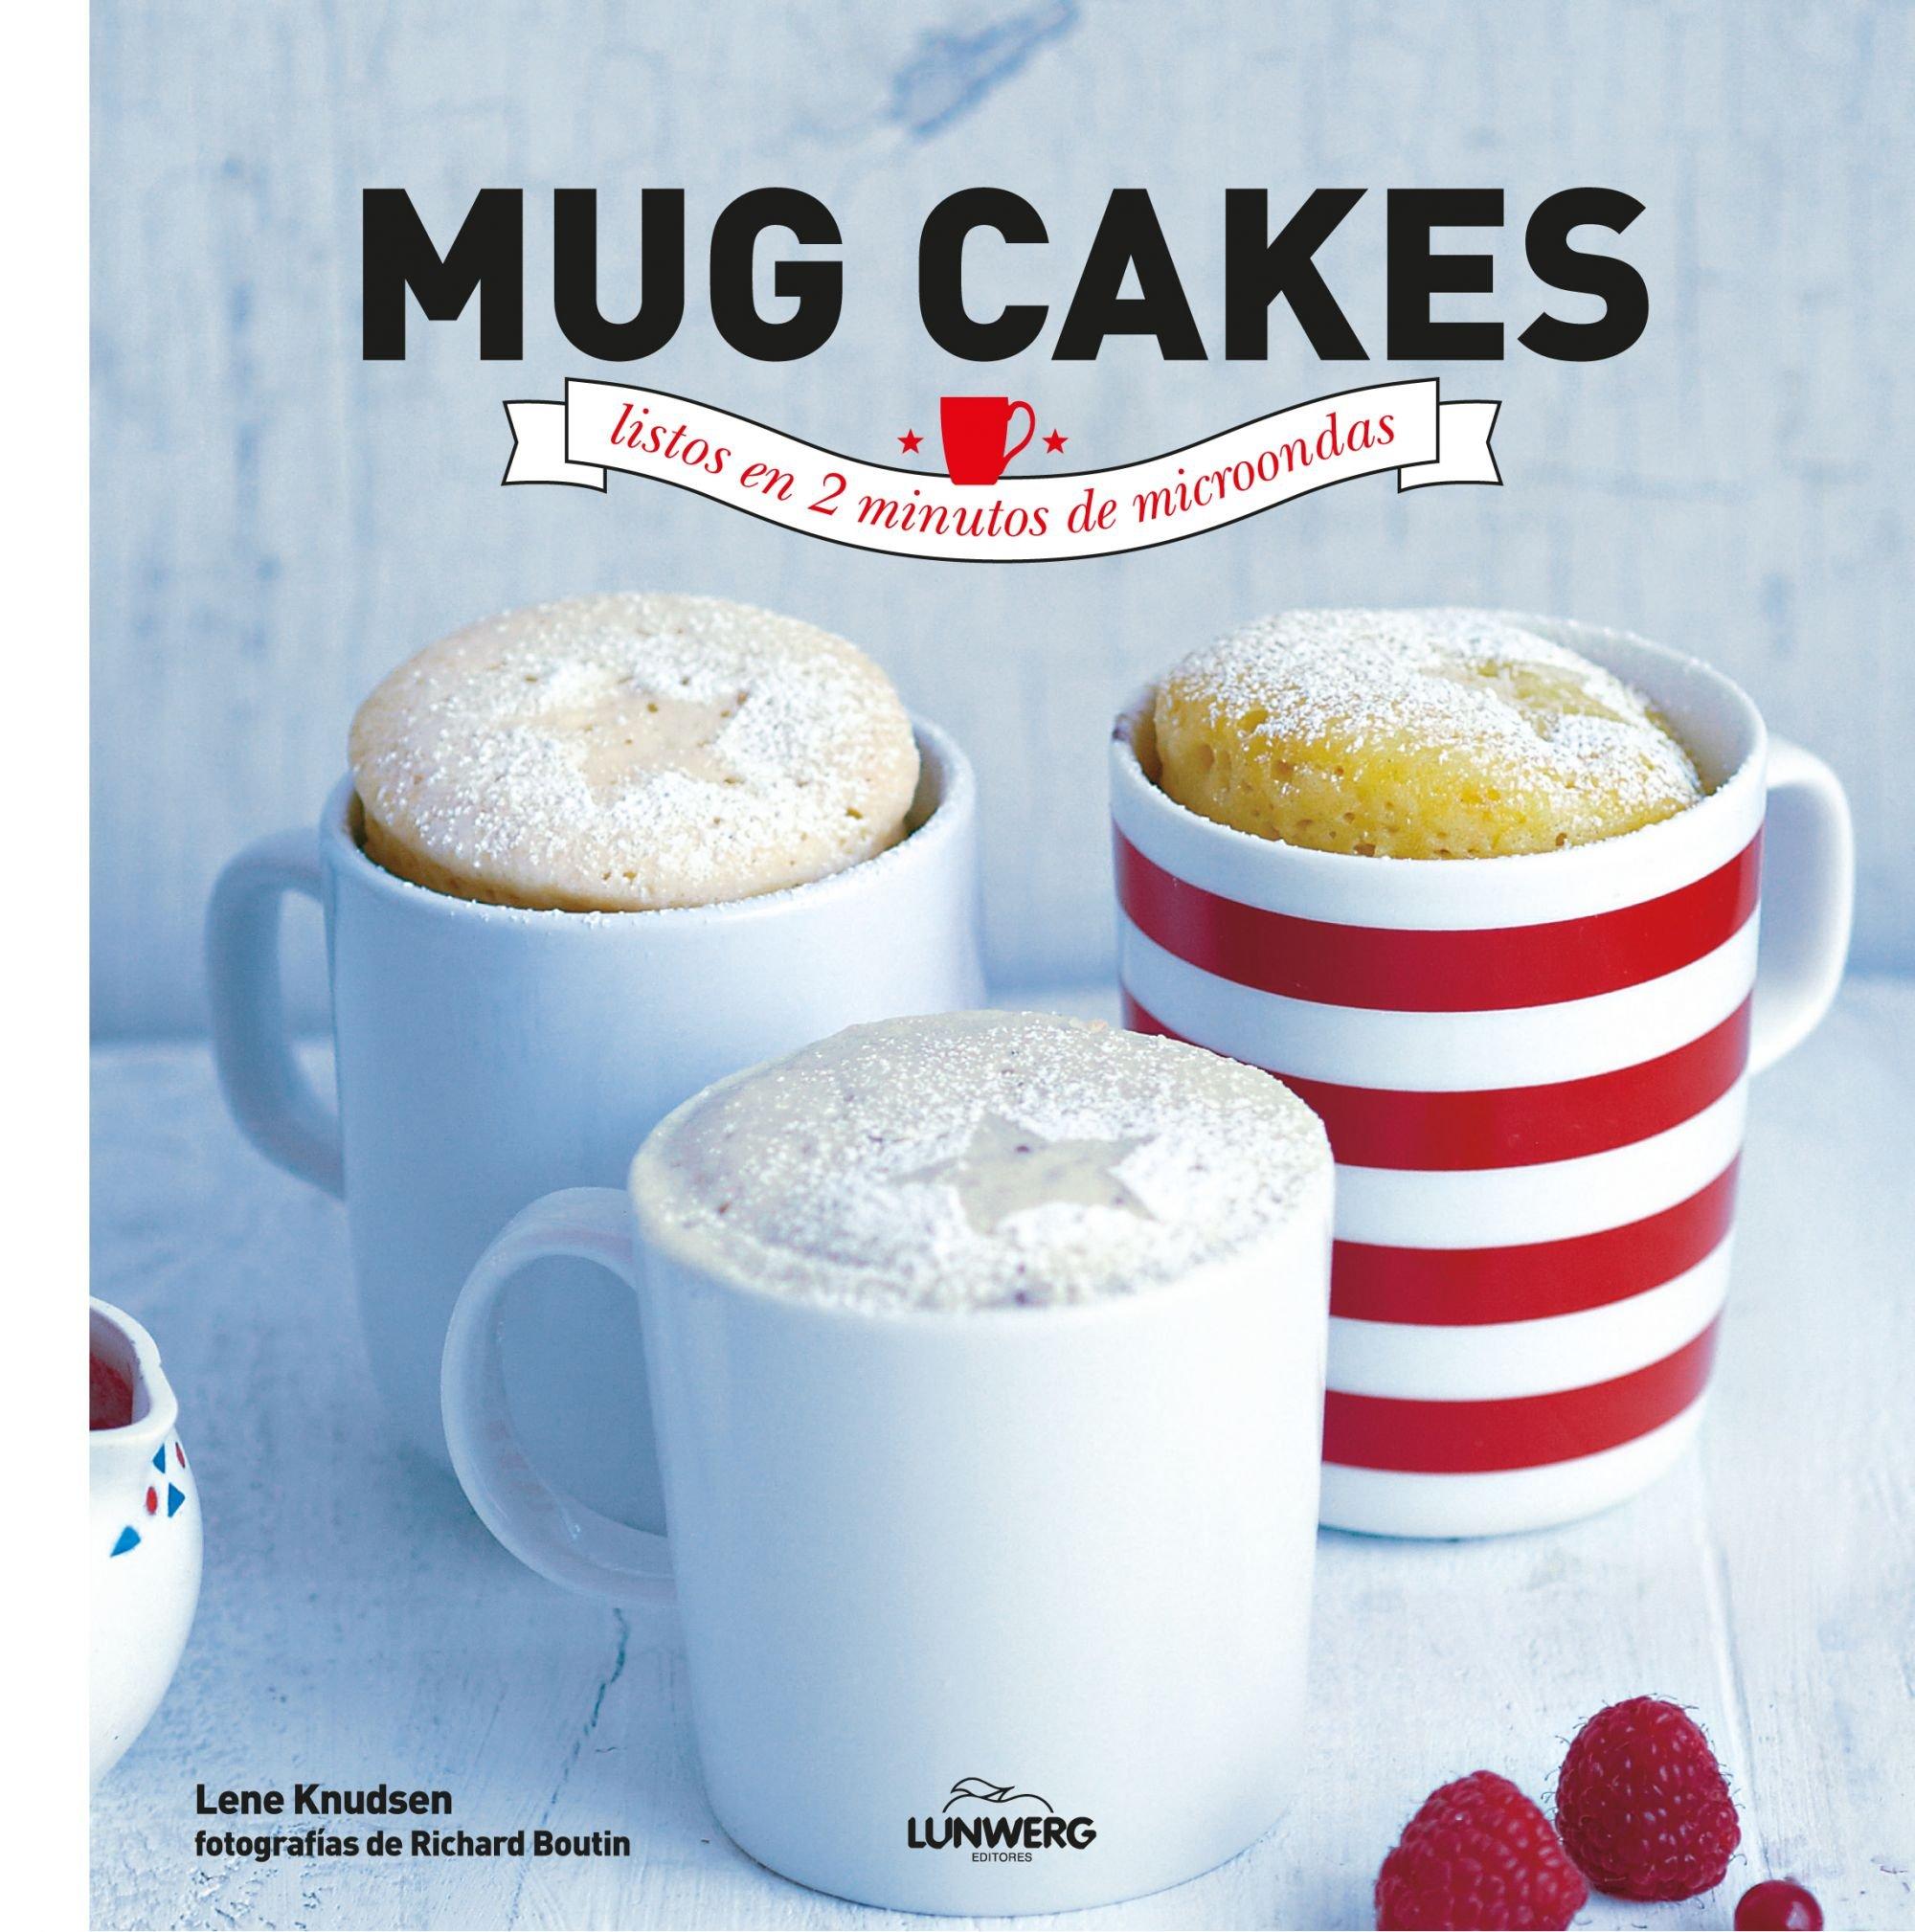 Mug cakes listos en 2 minutos de microondas Gastronomía: Amazon.es ...